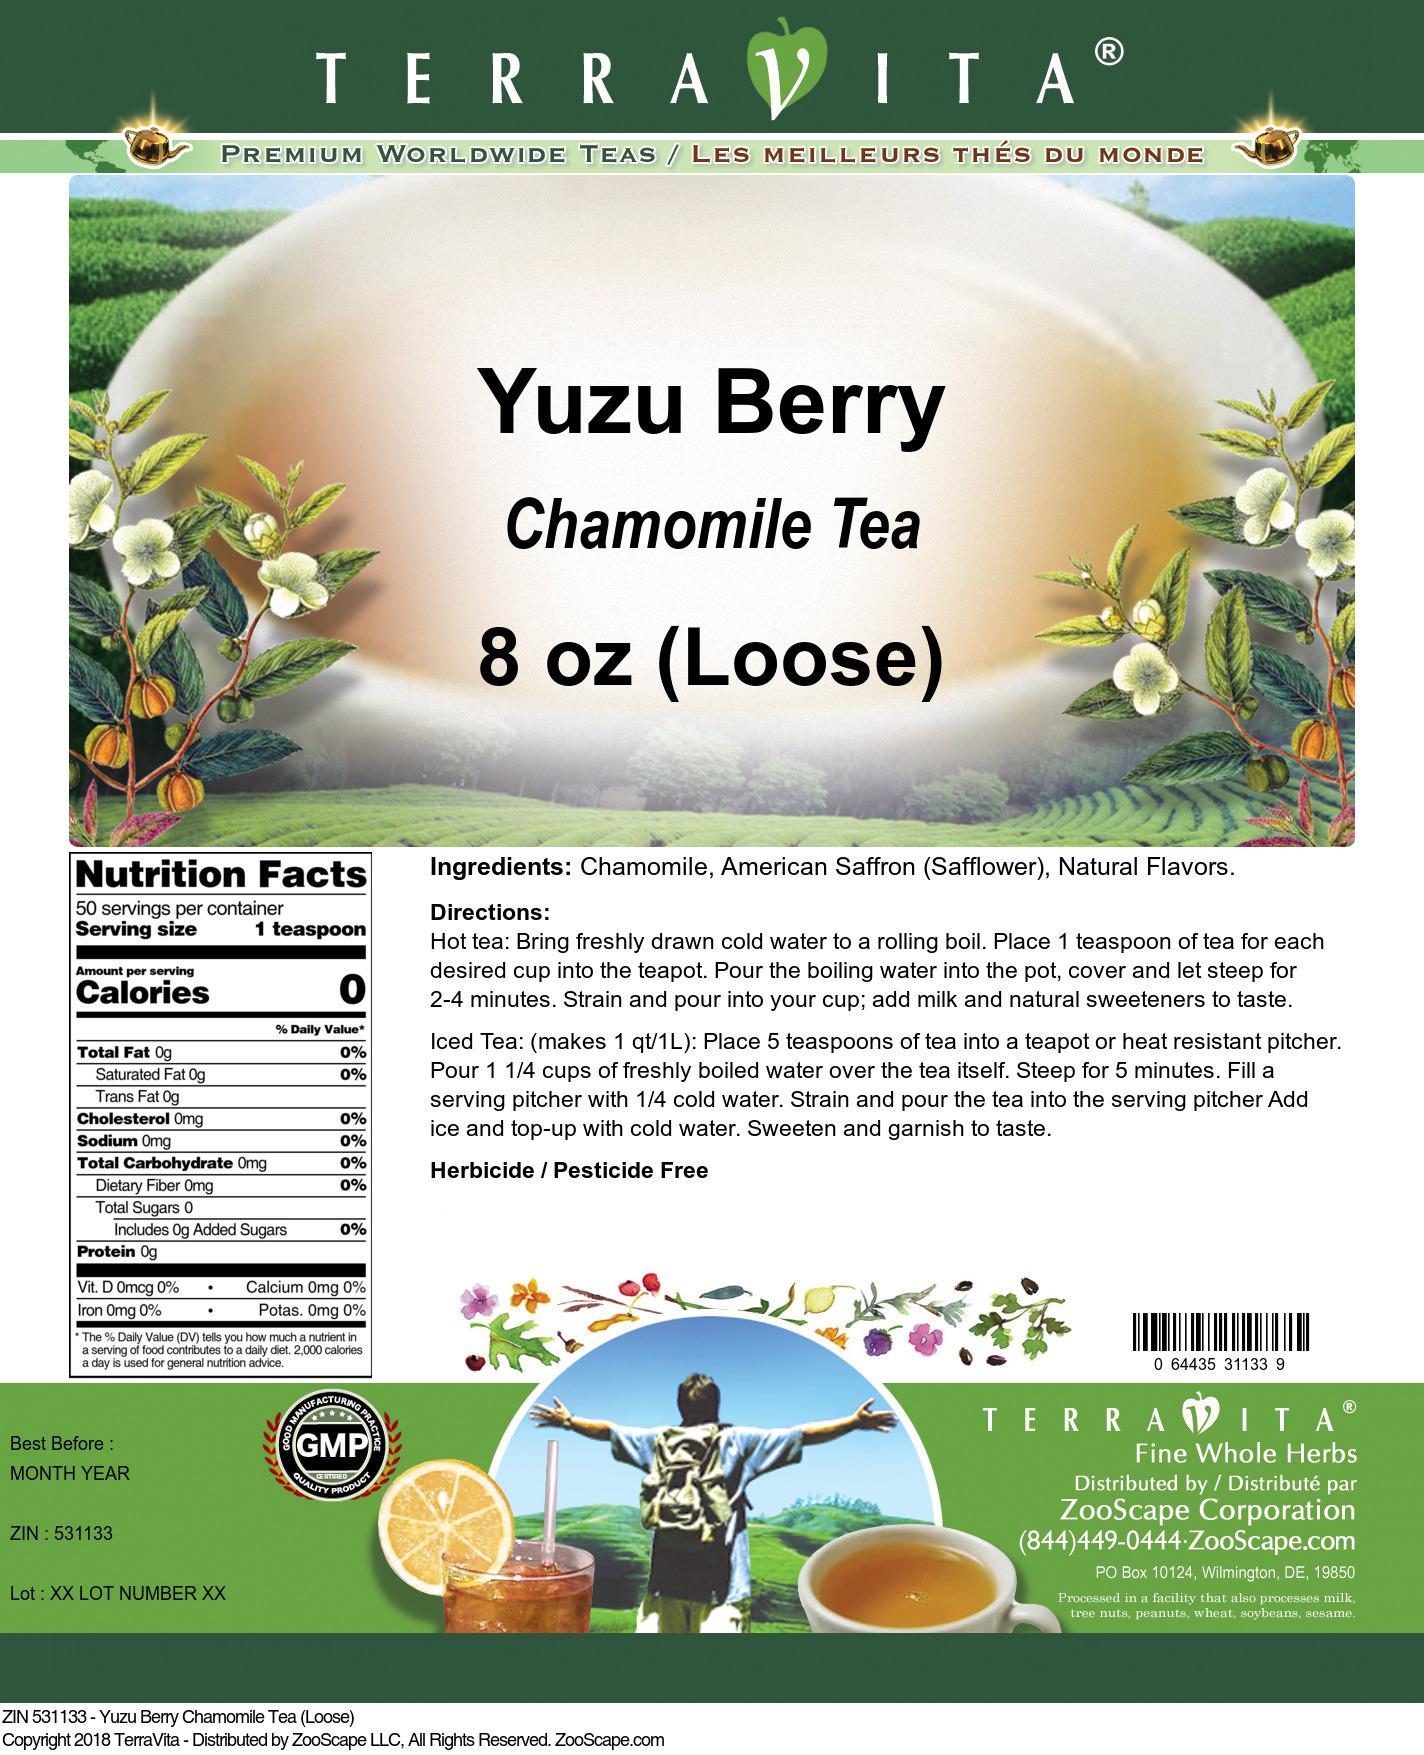 Yuzu Berry Chamomile Tea (Loose)